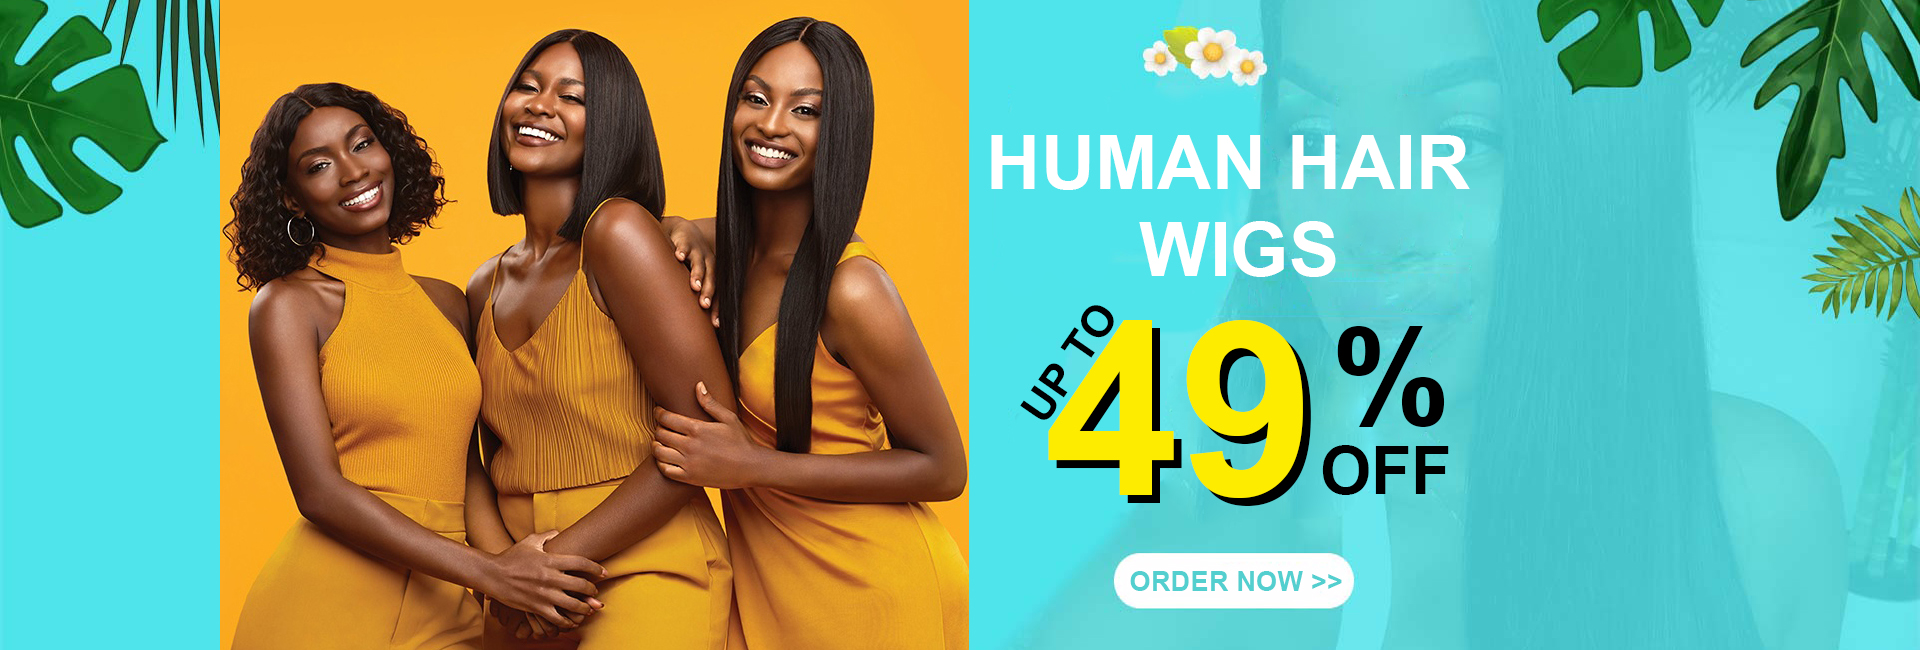 negras 150% 13x1 4x1 t parte peruca de cabelo humano